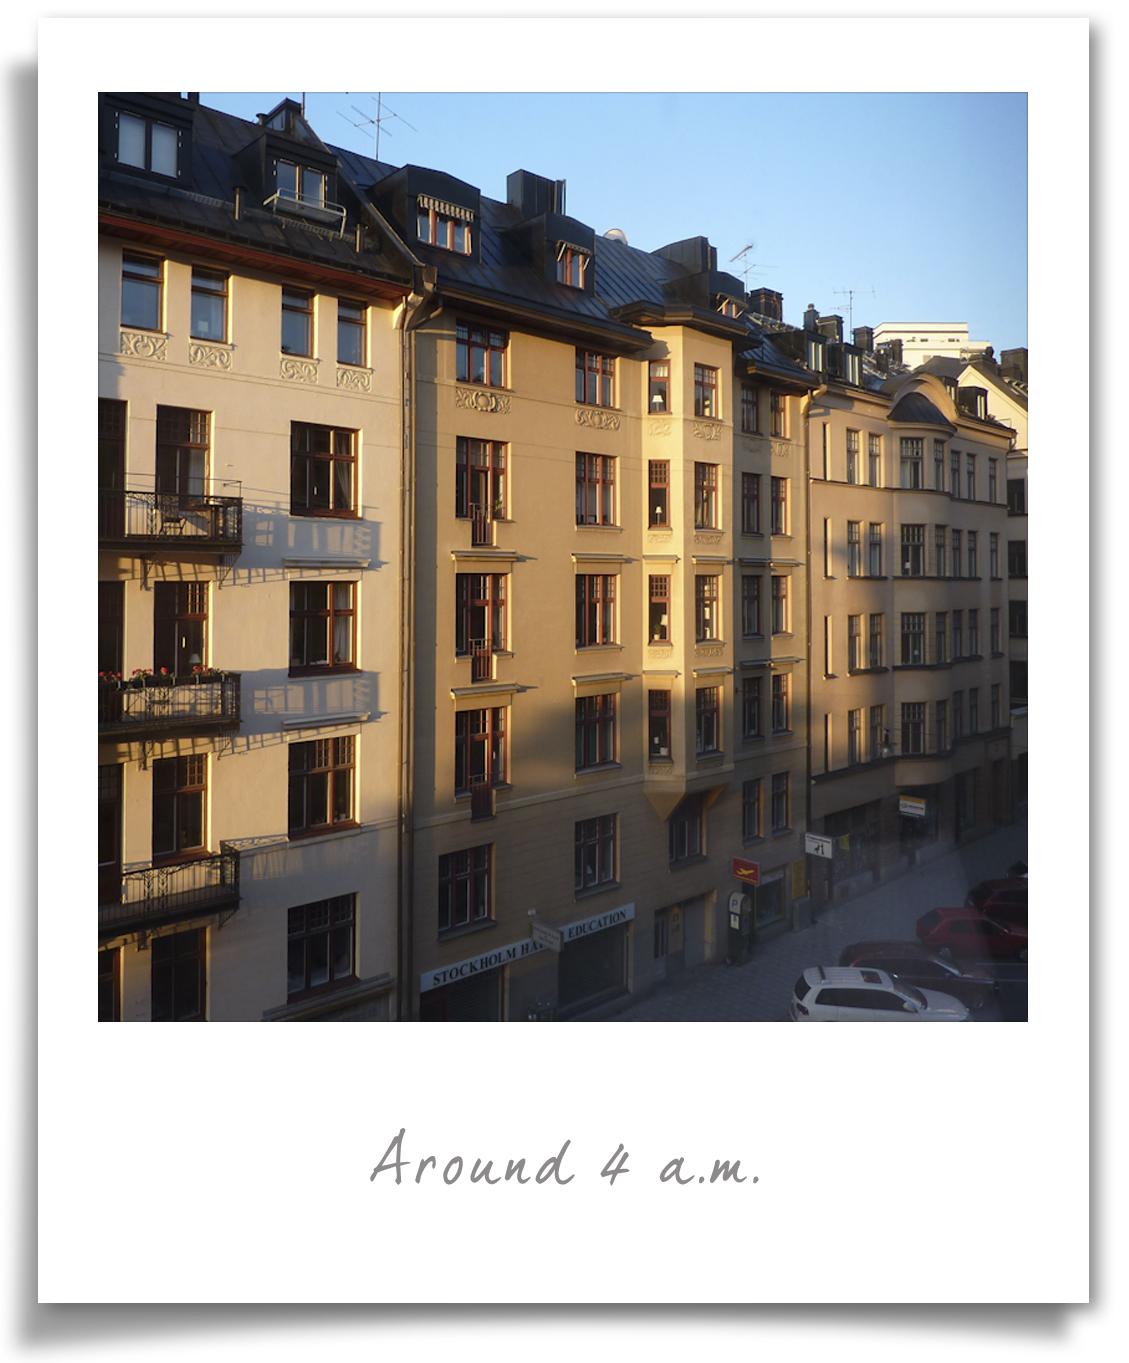 Stockholm - 4 am